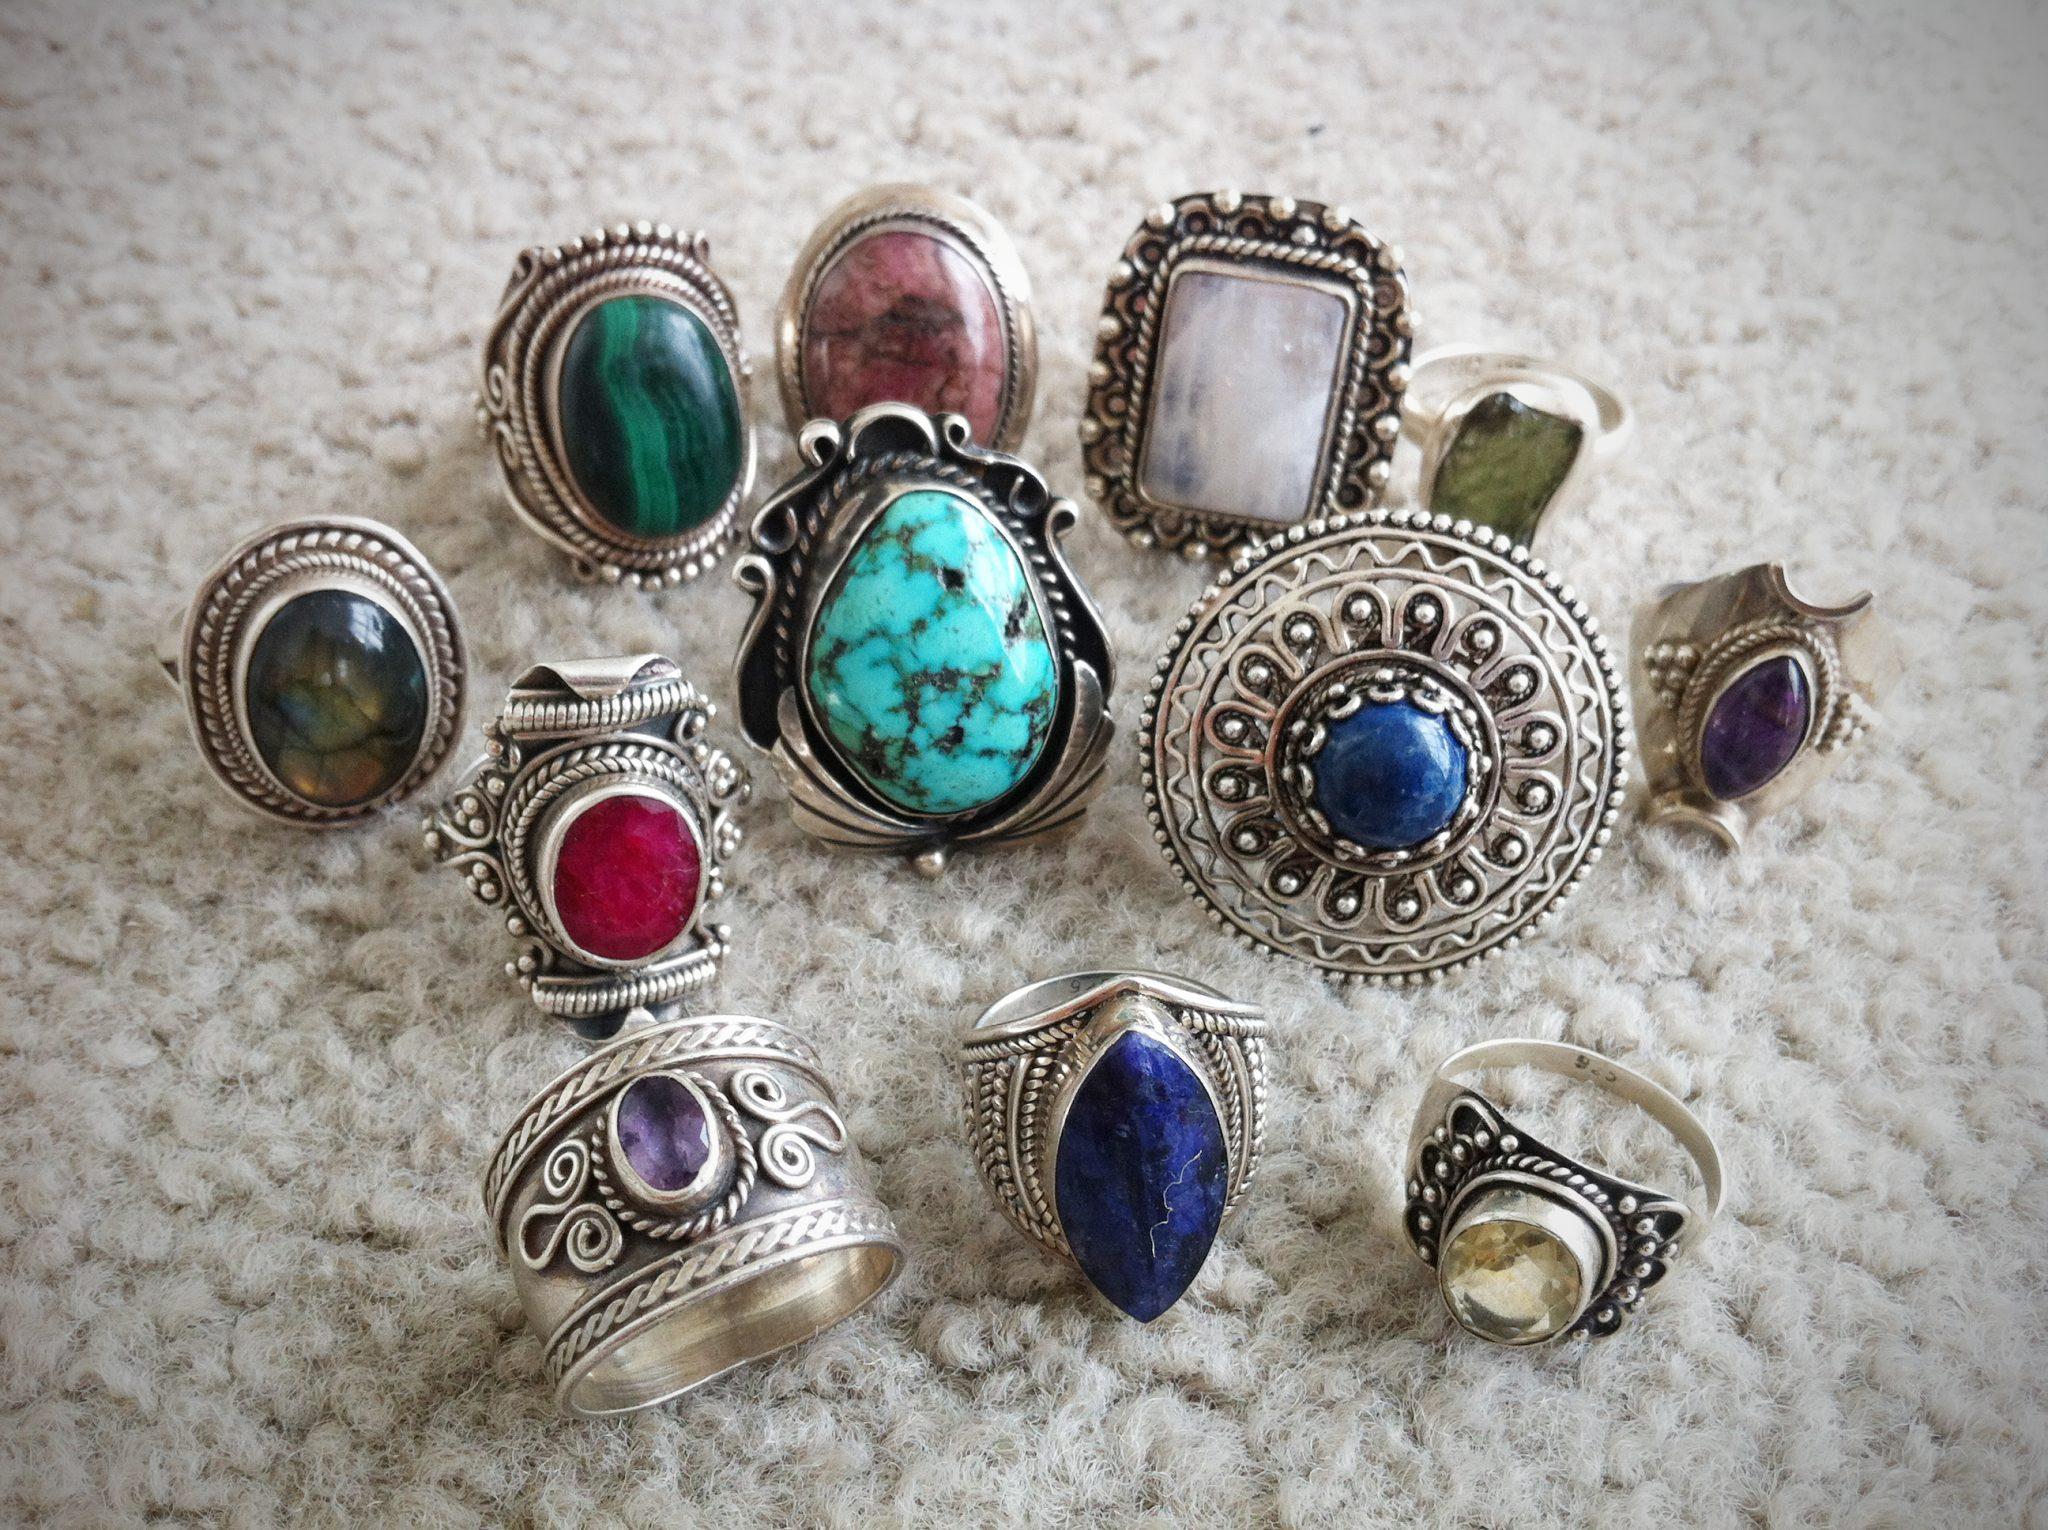 Antique Rings Jewelinfo4u Gemstones And Jewellery